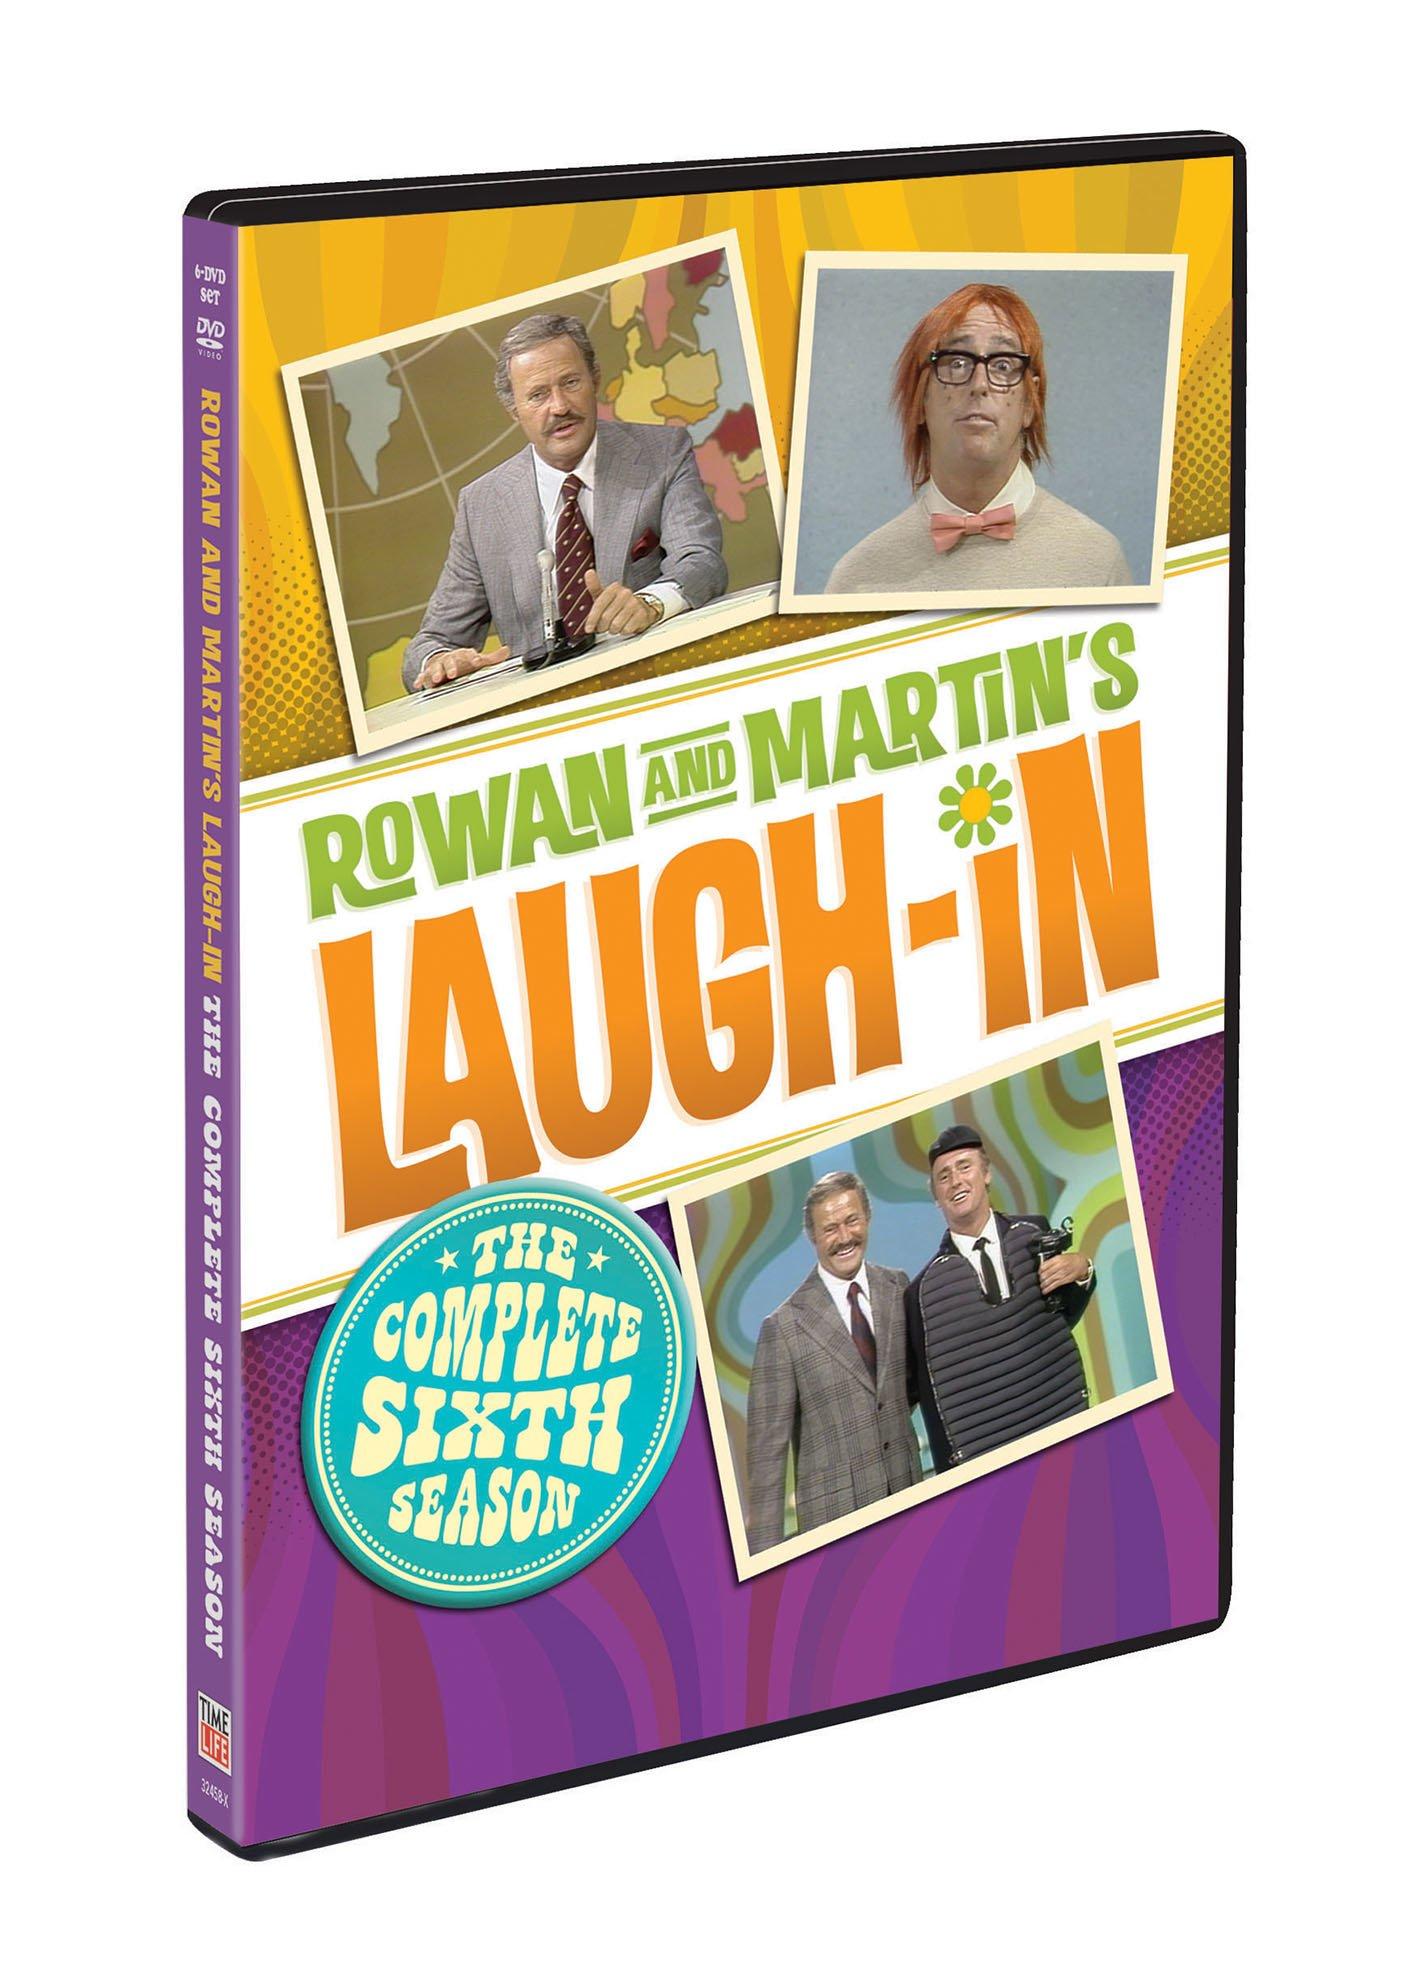 DVD : Rowan & Martin's Laugh-in: The Complete Sixth Season (6PC)